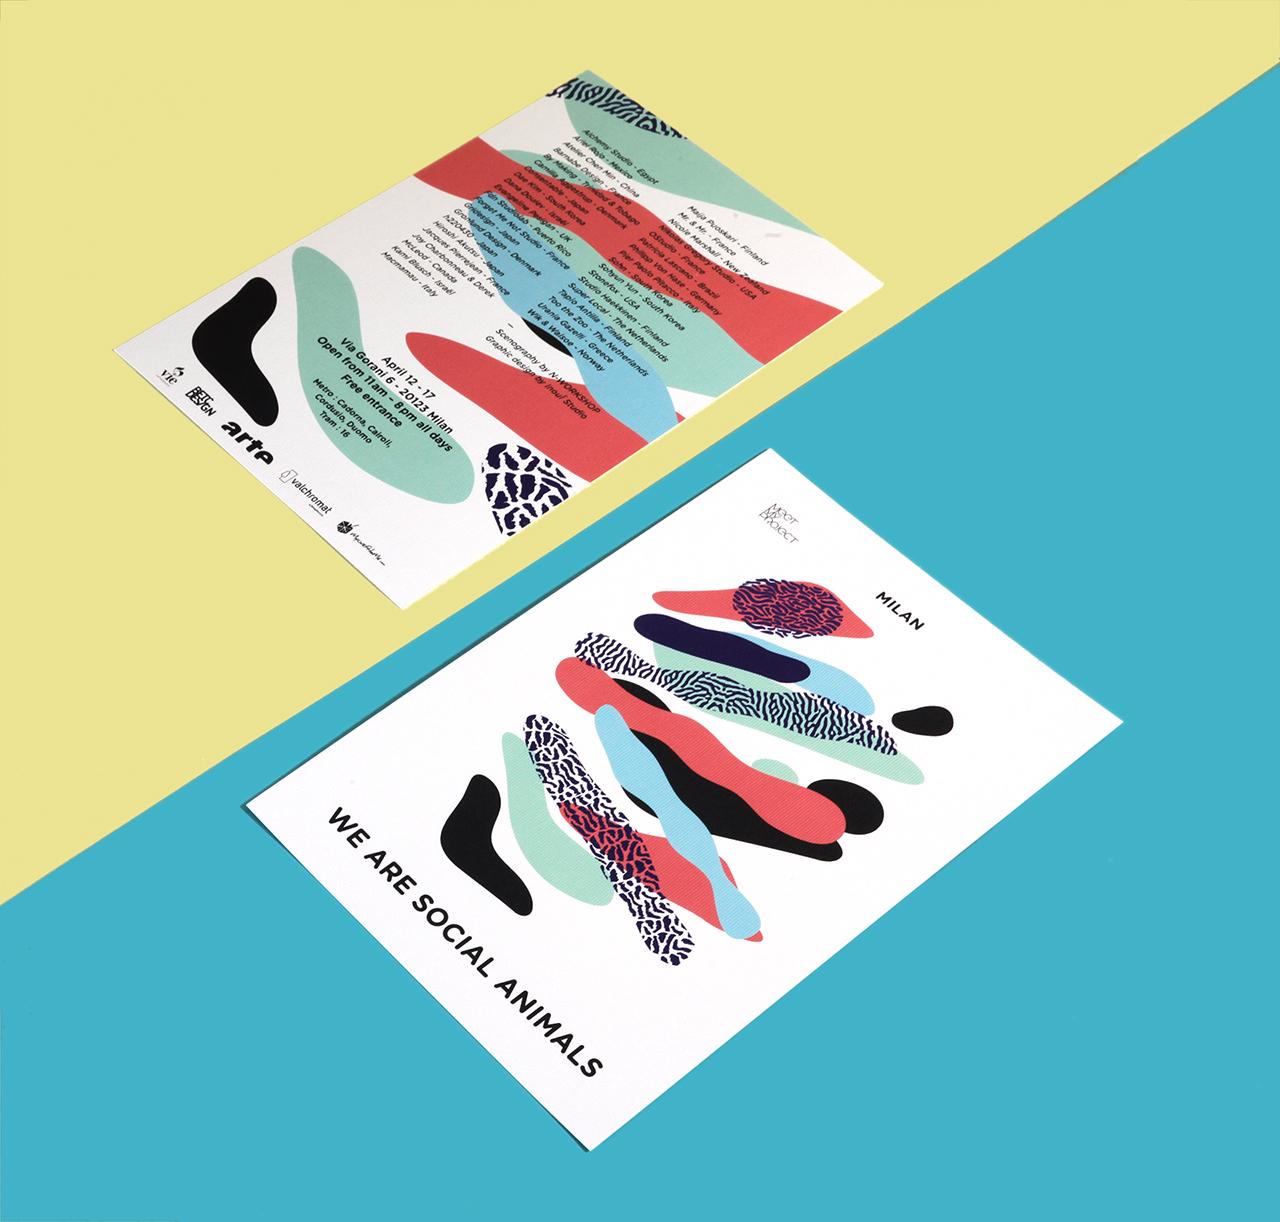 3-meet-my-project-coco-art-direction-print-inoui-studio-paris